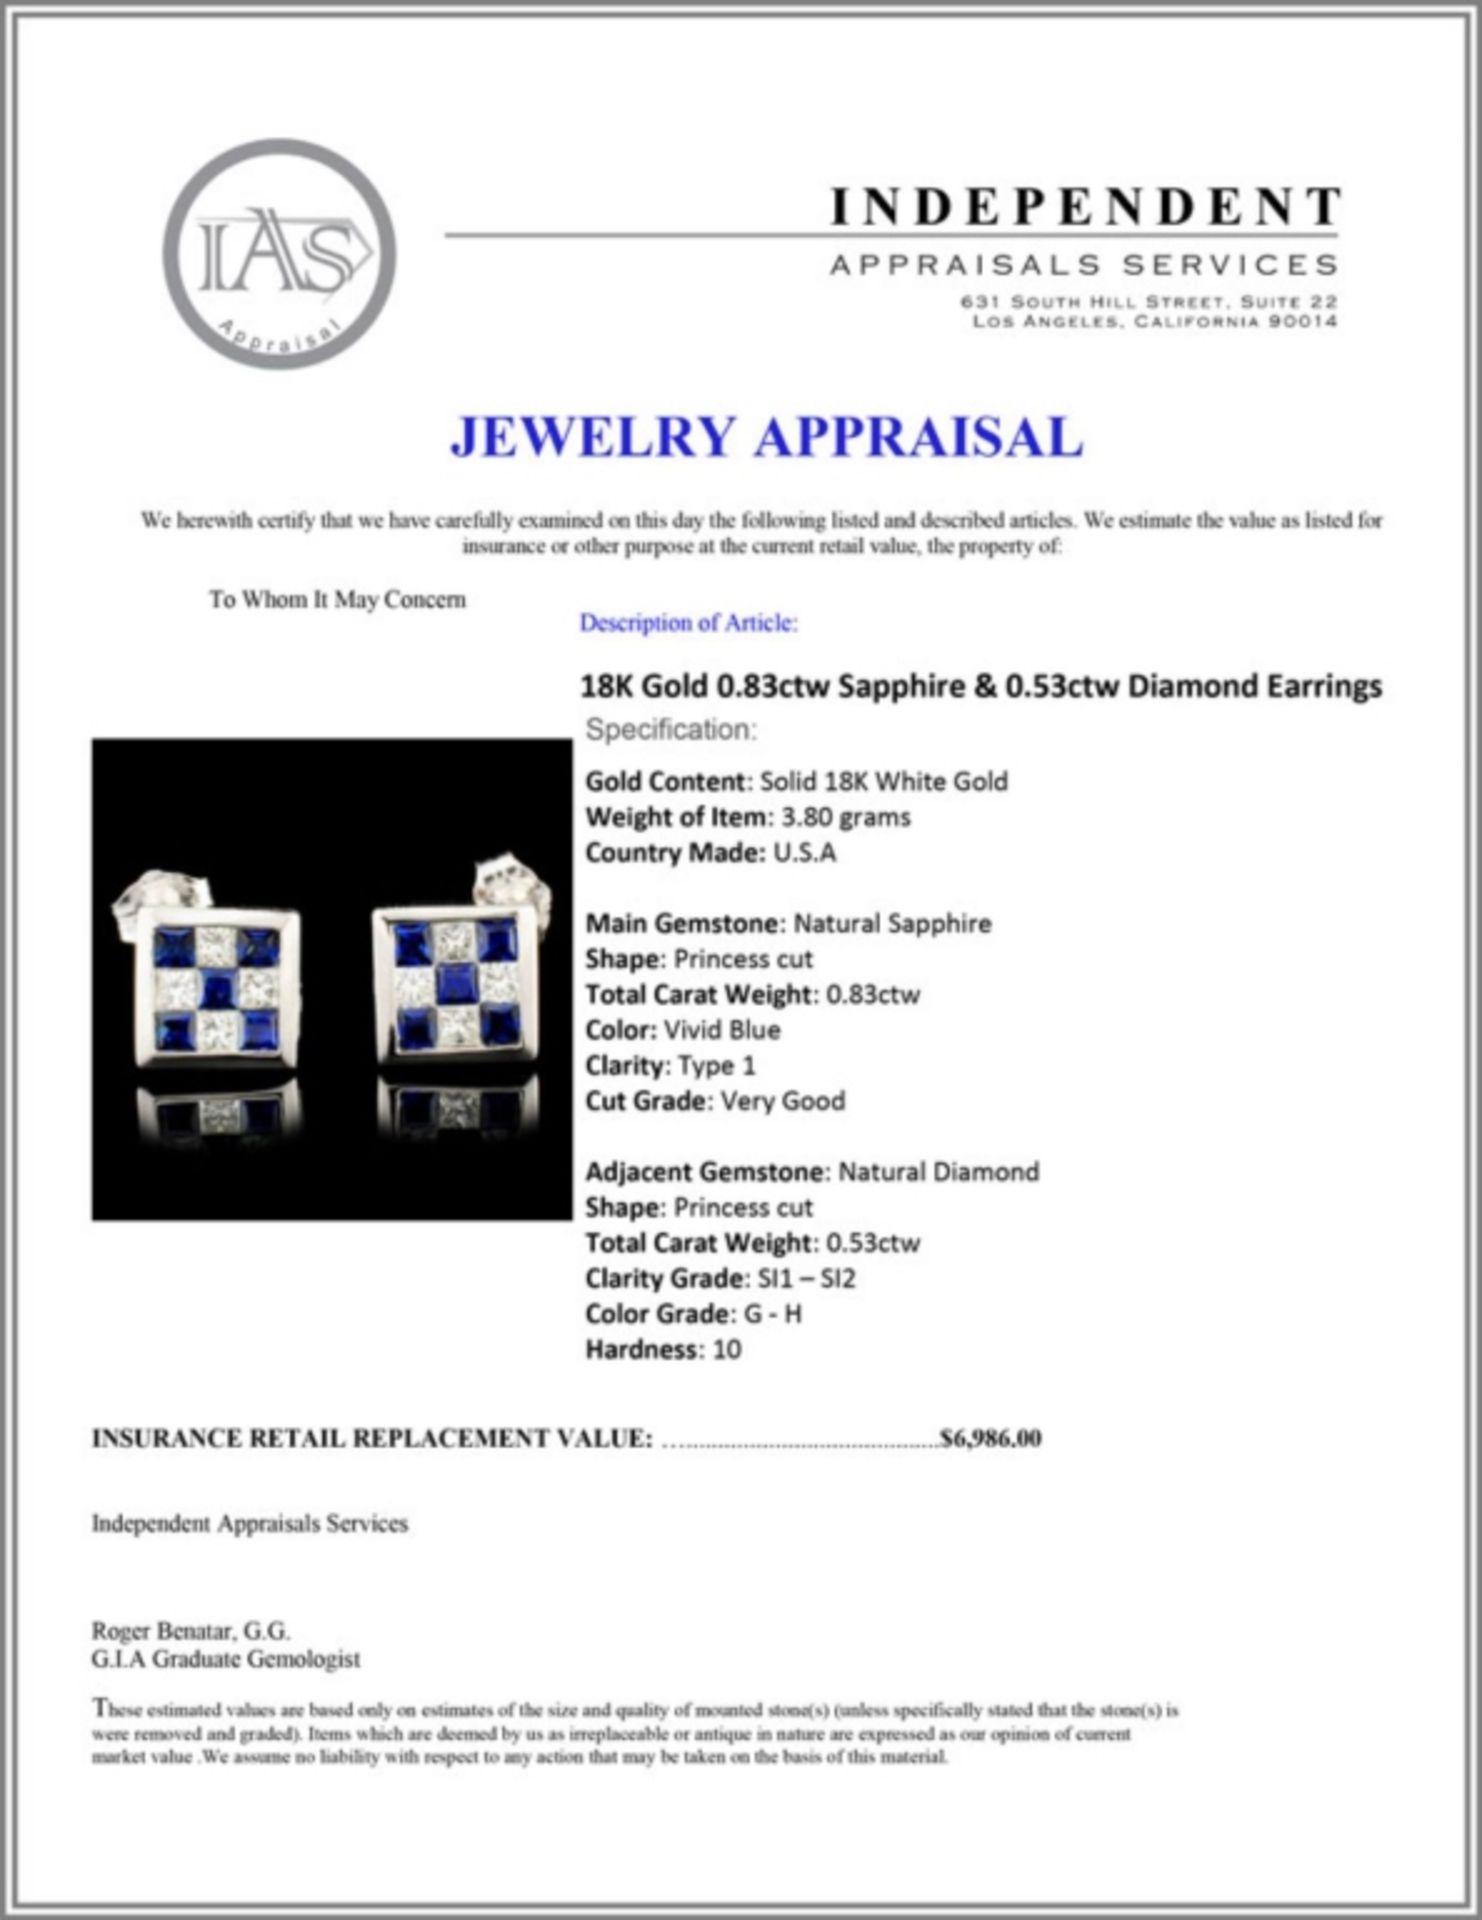 18K Gold 0.83ctw Sapphire & 0.53ctw Diamond Earrin - Image 3 of 3